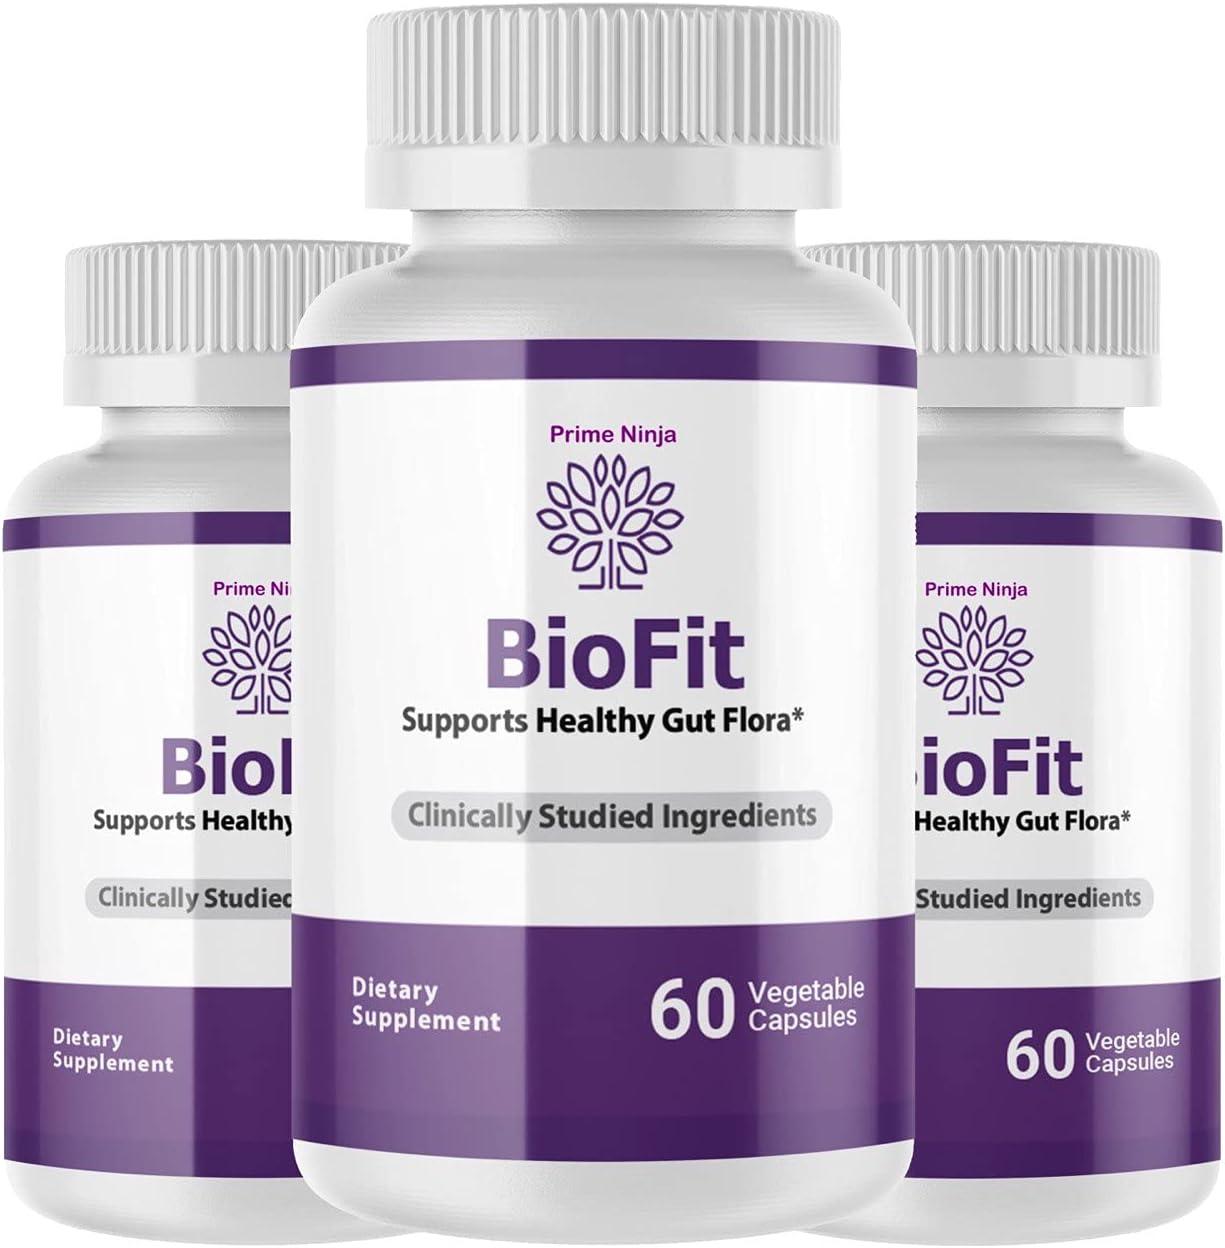 Max 48% OFF Max 57% OFF 3 Pack BioFit Probiotic Capsules. Cap The Official 180